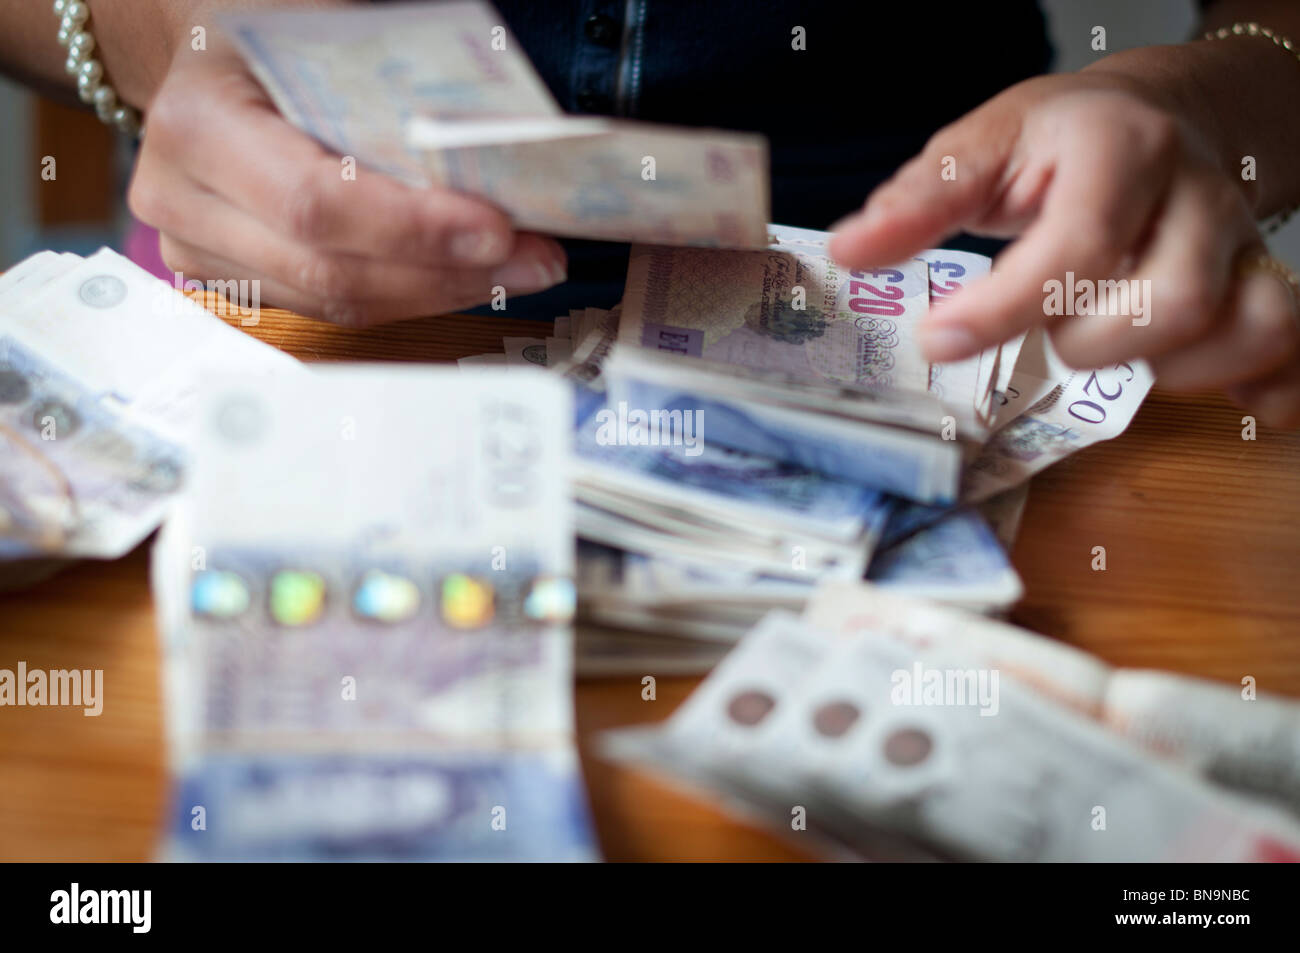 Person zählen Bargeld-Close-up Stockfoto